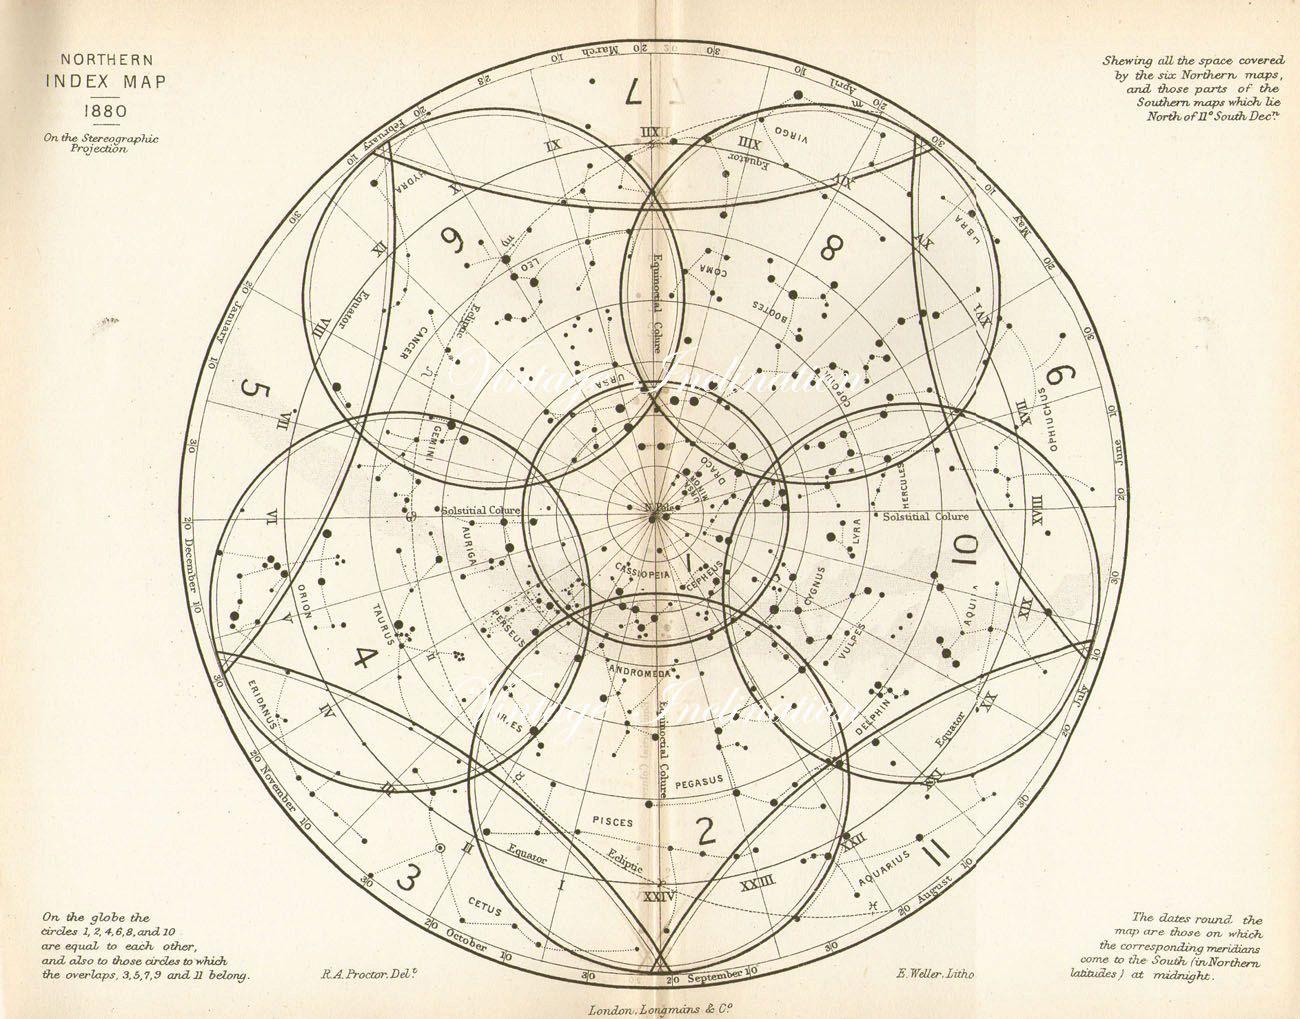 029b4442ec9a93261feca65032669c81 vintage charts google search charts, diagrams, maps, etc star